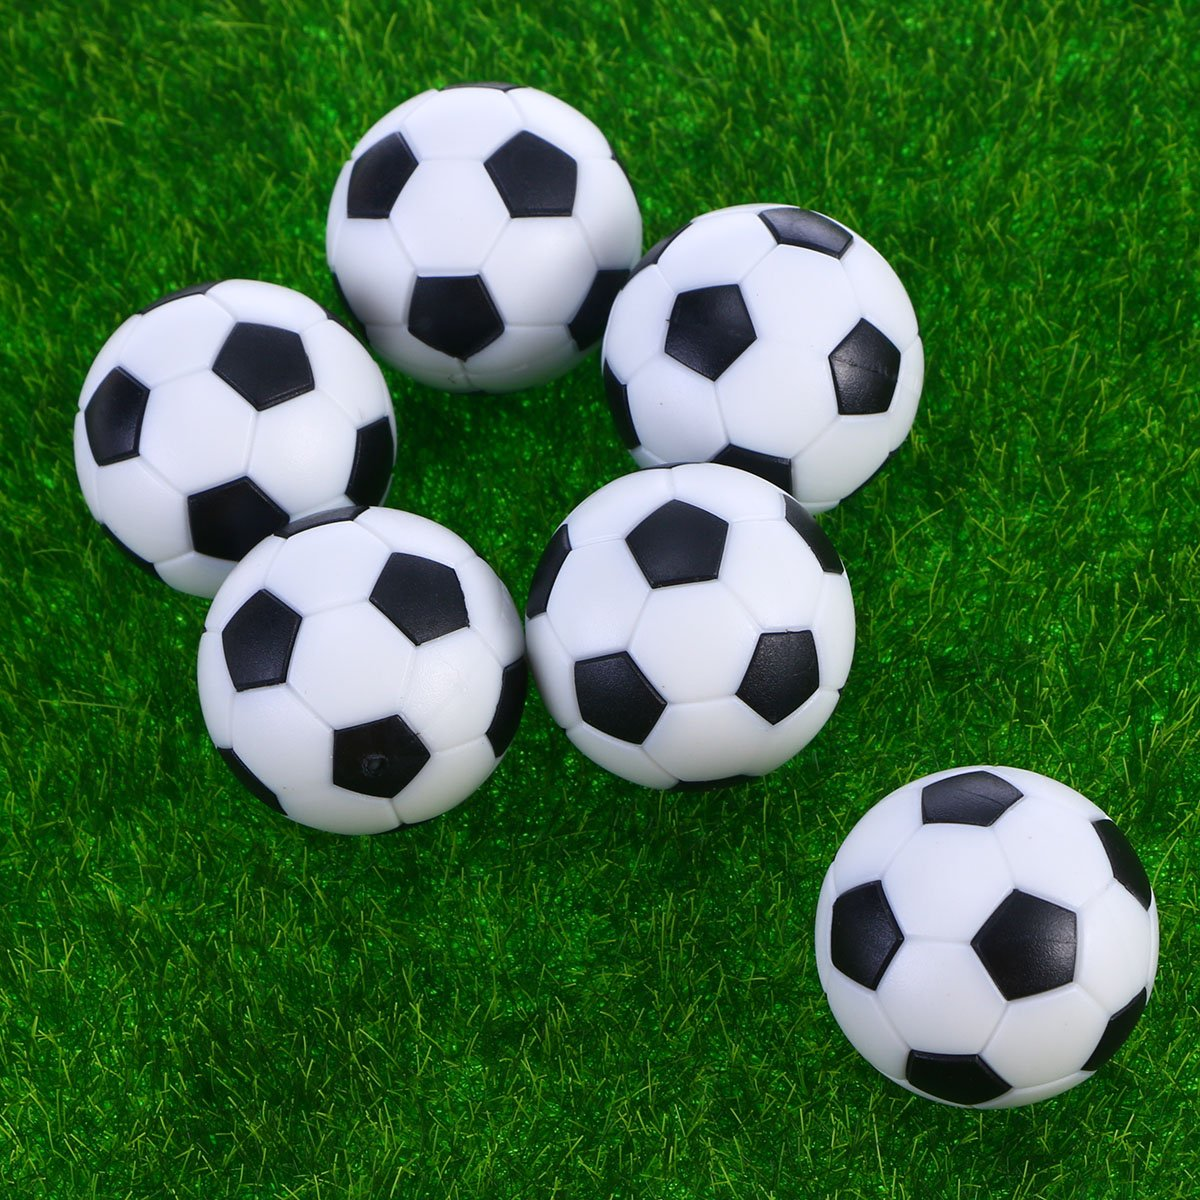 VORCOOL Reemplazos de Foosballs de f/útbol de Mesa Mini Paquete de Pelotas de f/útbol de Color Blanco Negro de 6